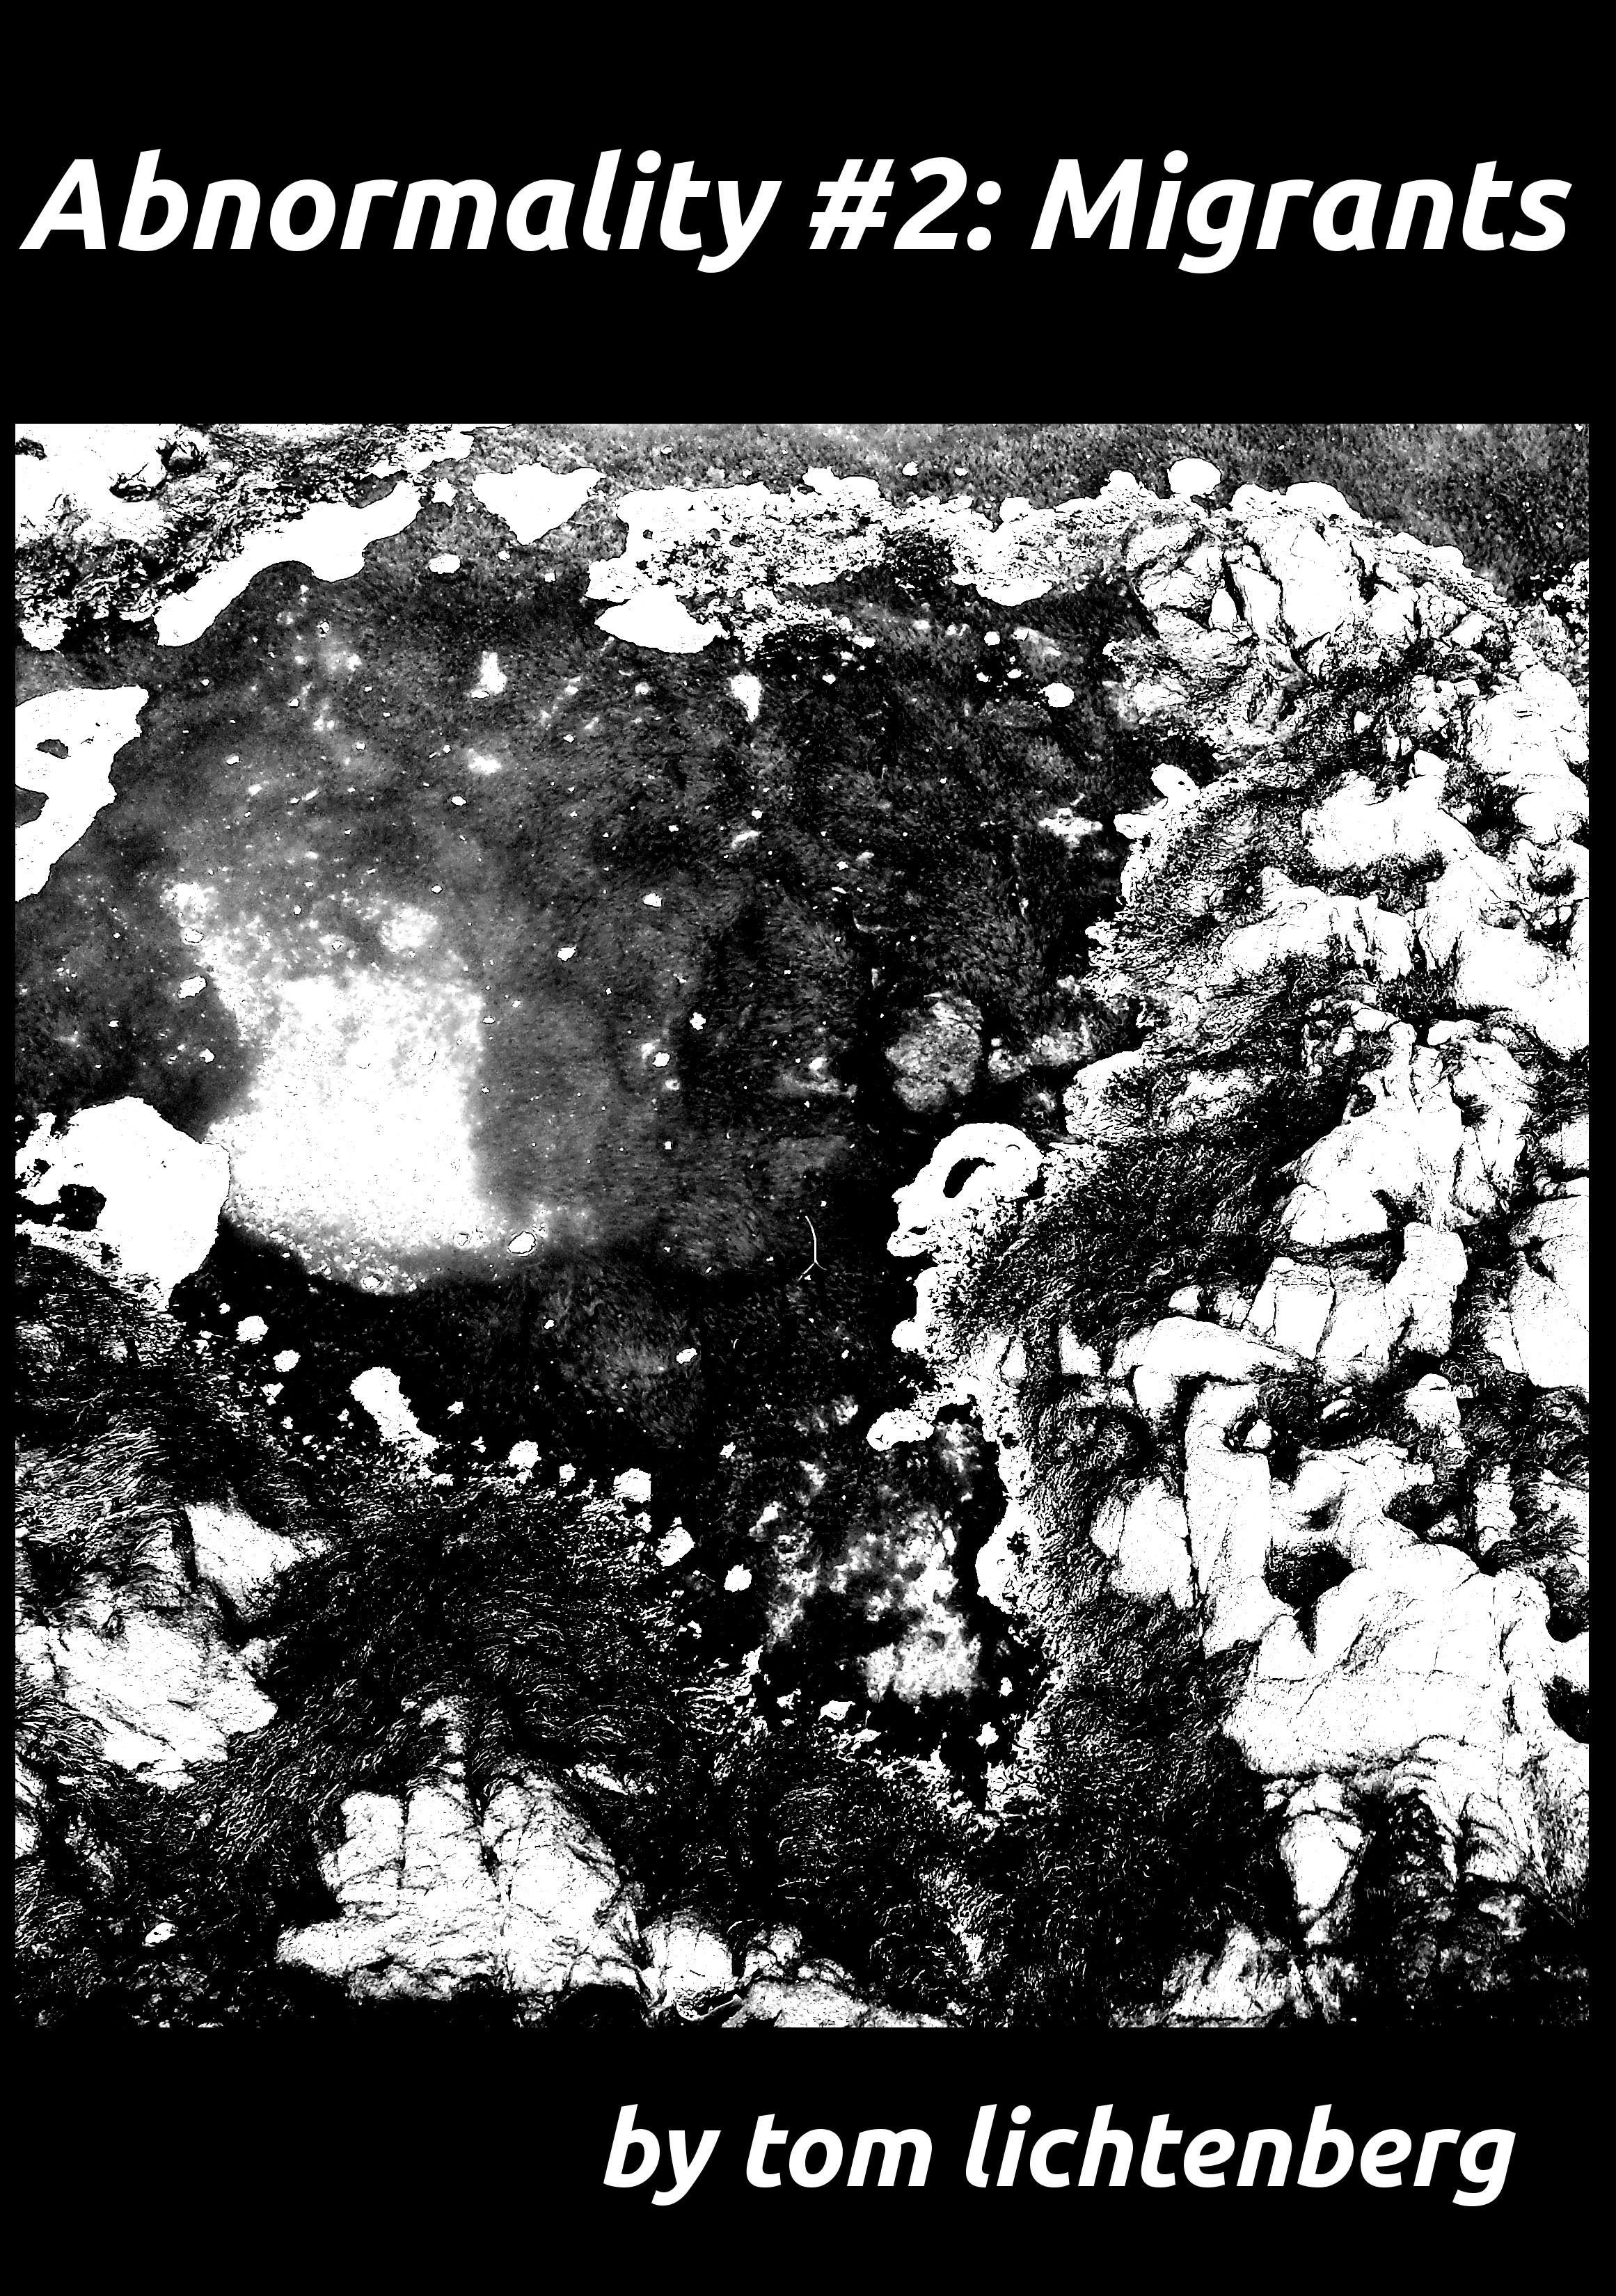 Tom Lichtenberg - Abnormality #2: Migrants